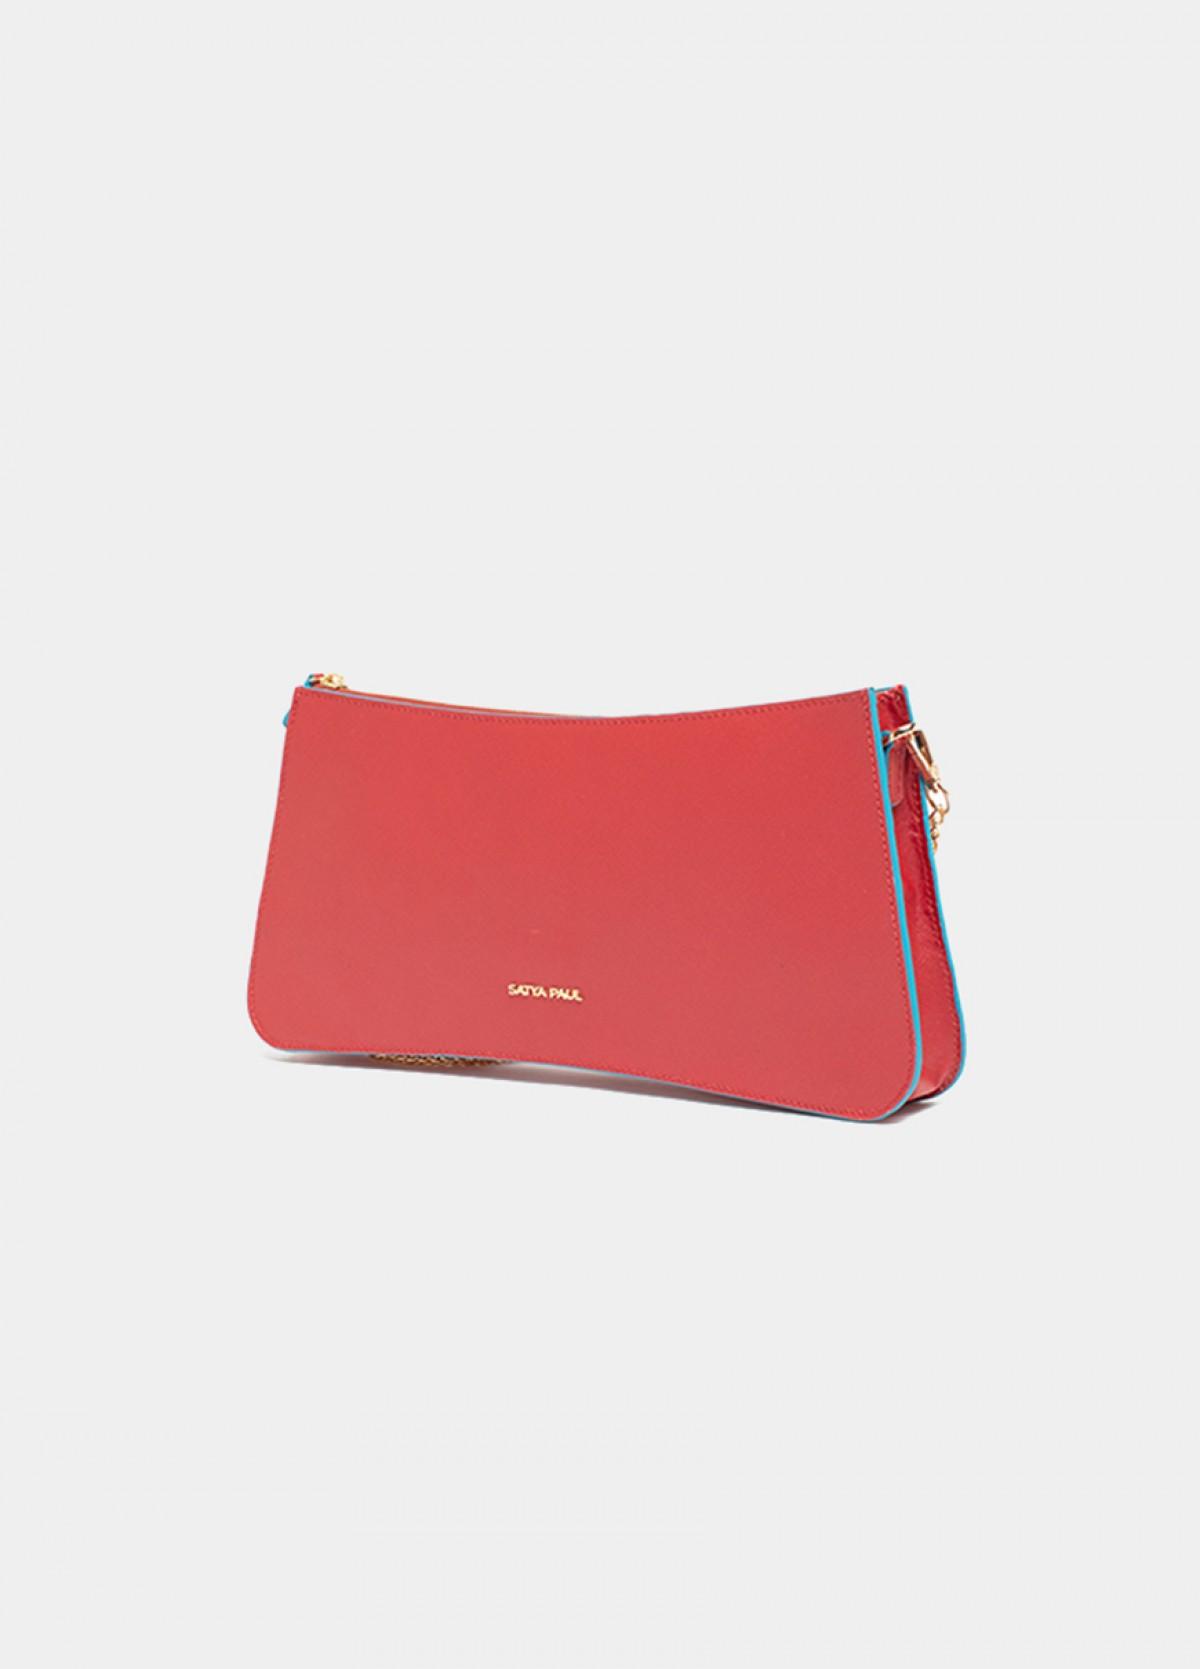 The Kalahoi Sling Bag